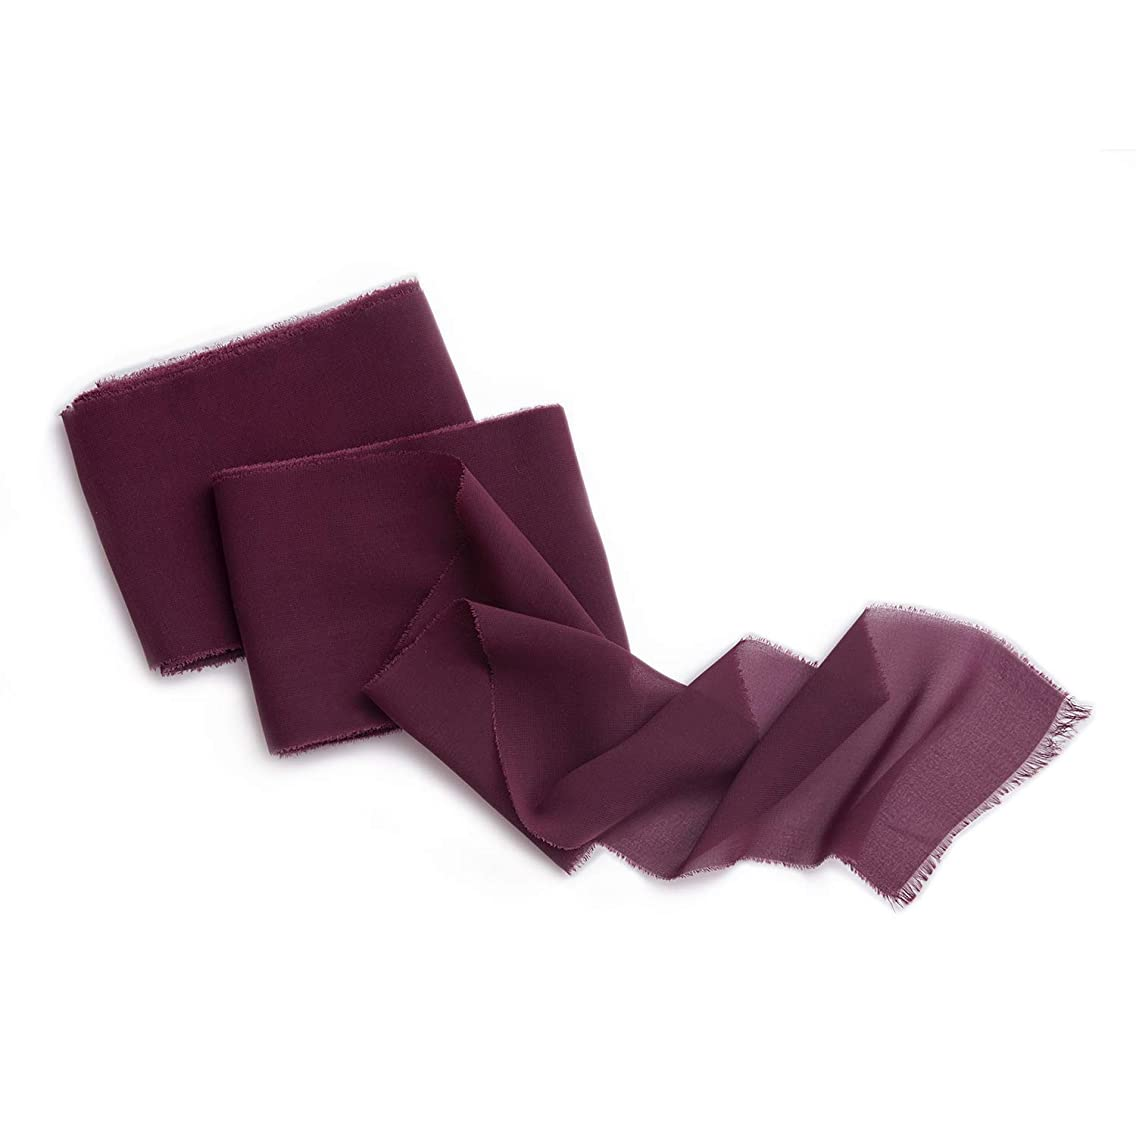 Ling's moment Handmade Burgundy Chiffon Silk Ribbon 4-3/4